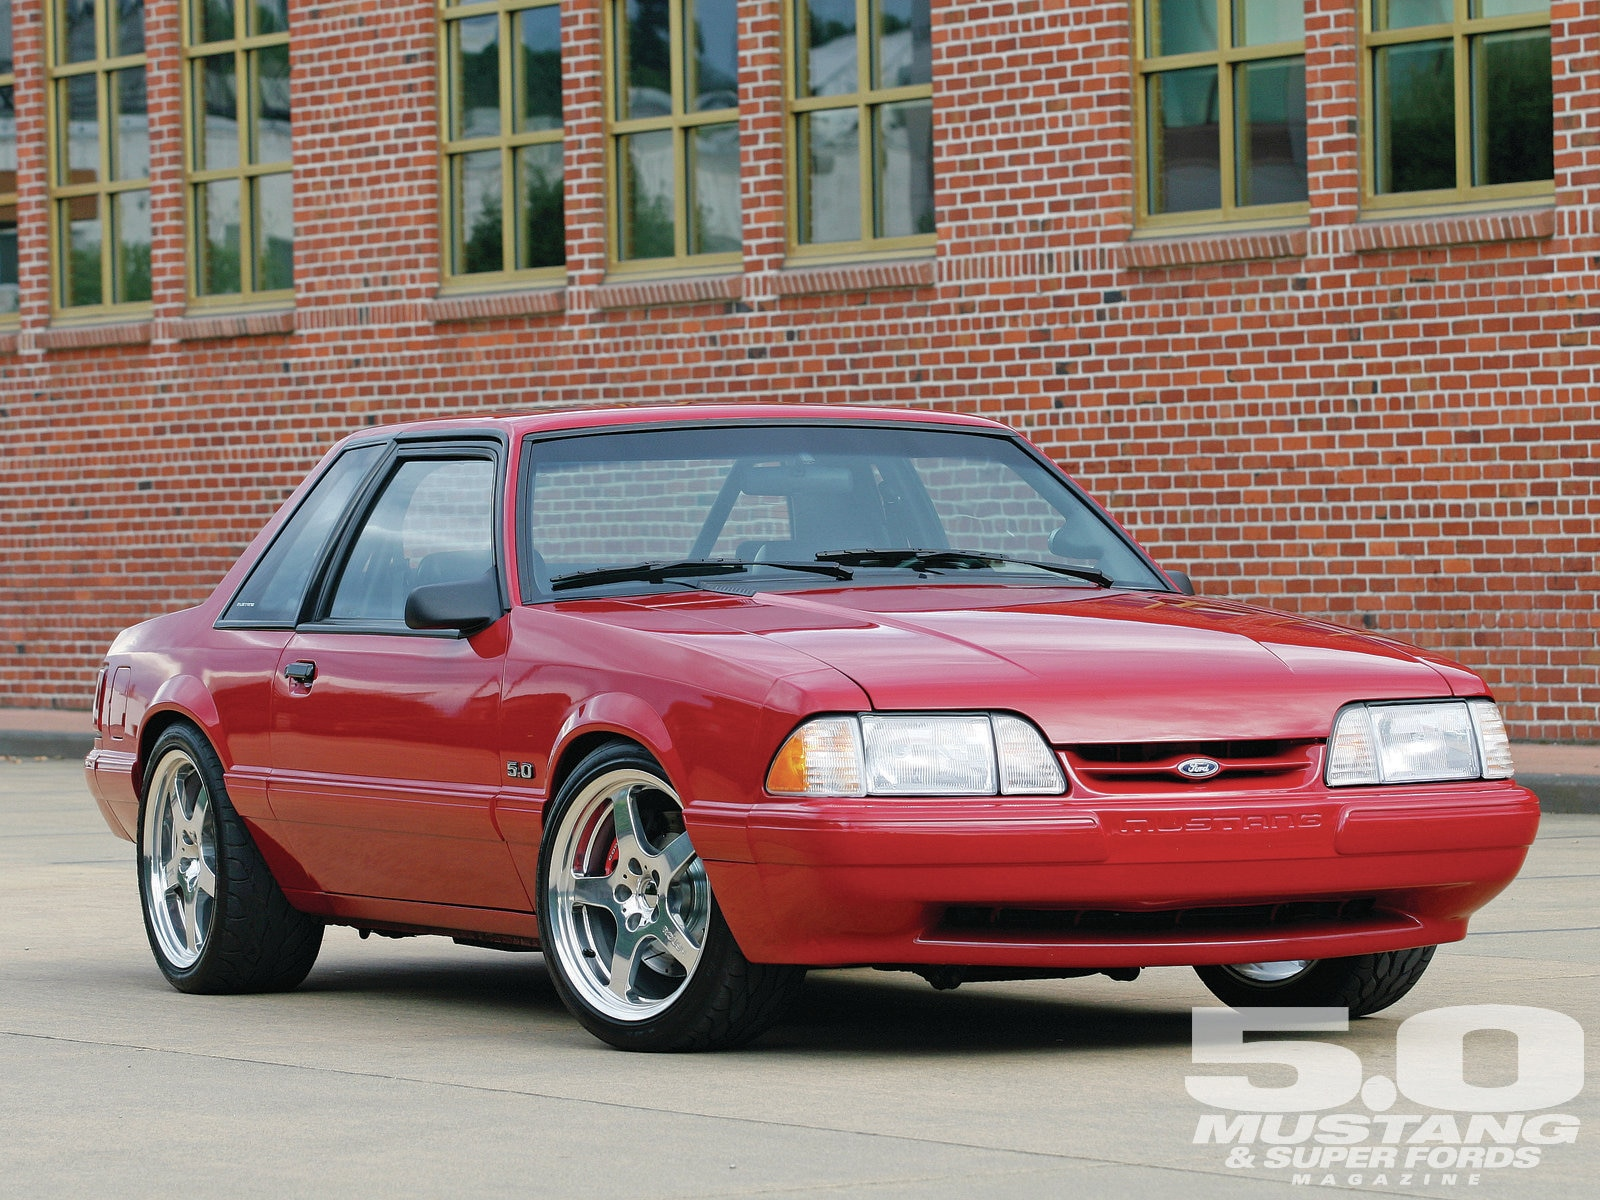 1993 ford mustang lx generation diy 5 0 mustang \u0026 super fords 1969 Ford Mustang 1993 ford mustang lx generation diy